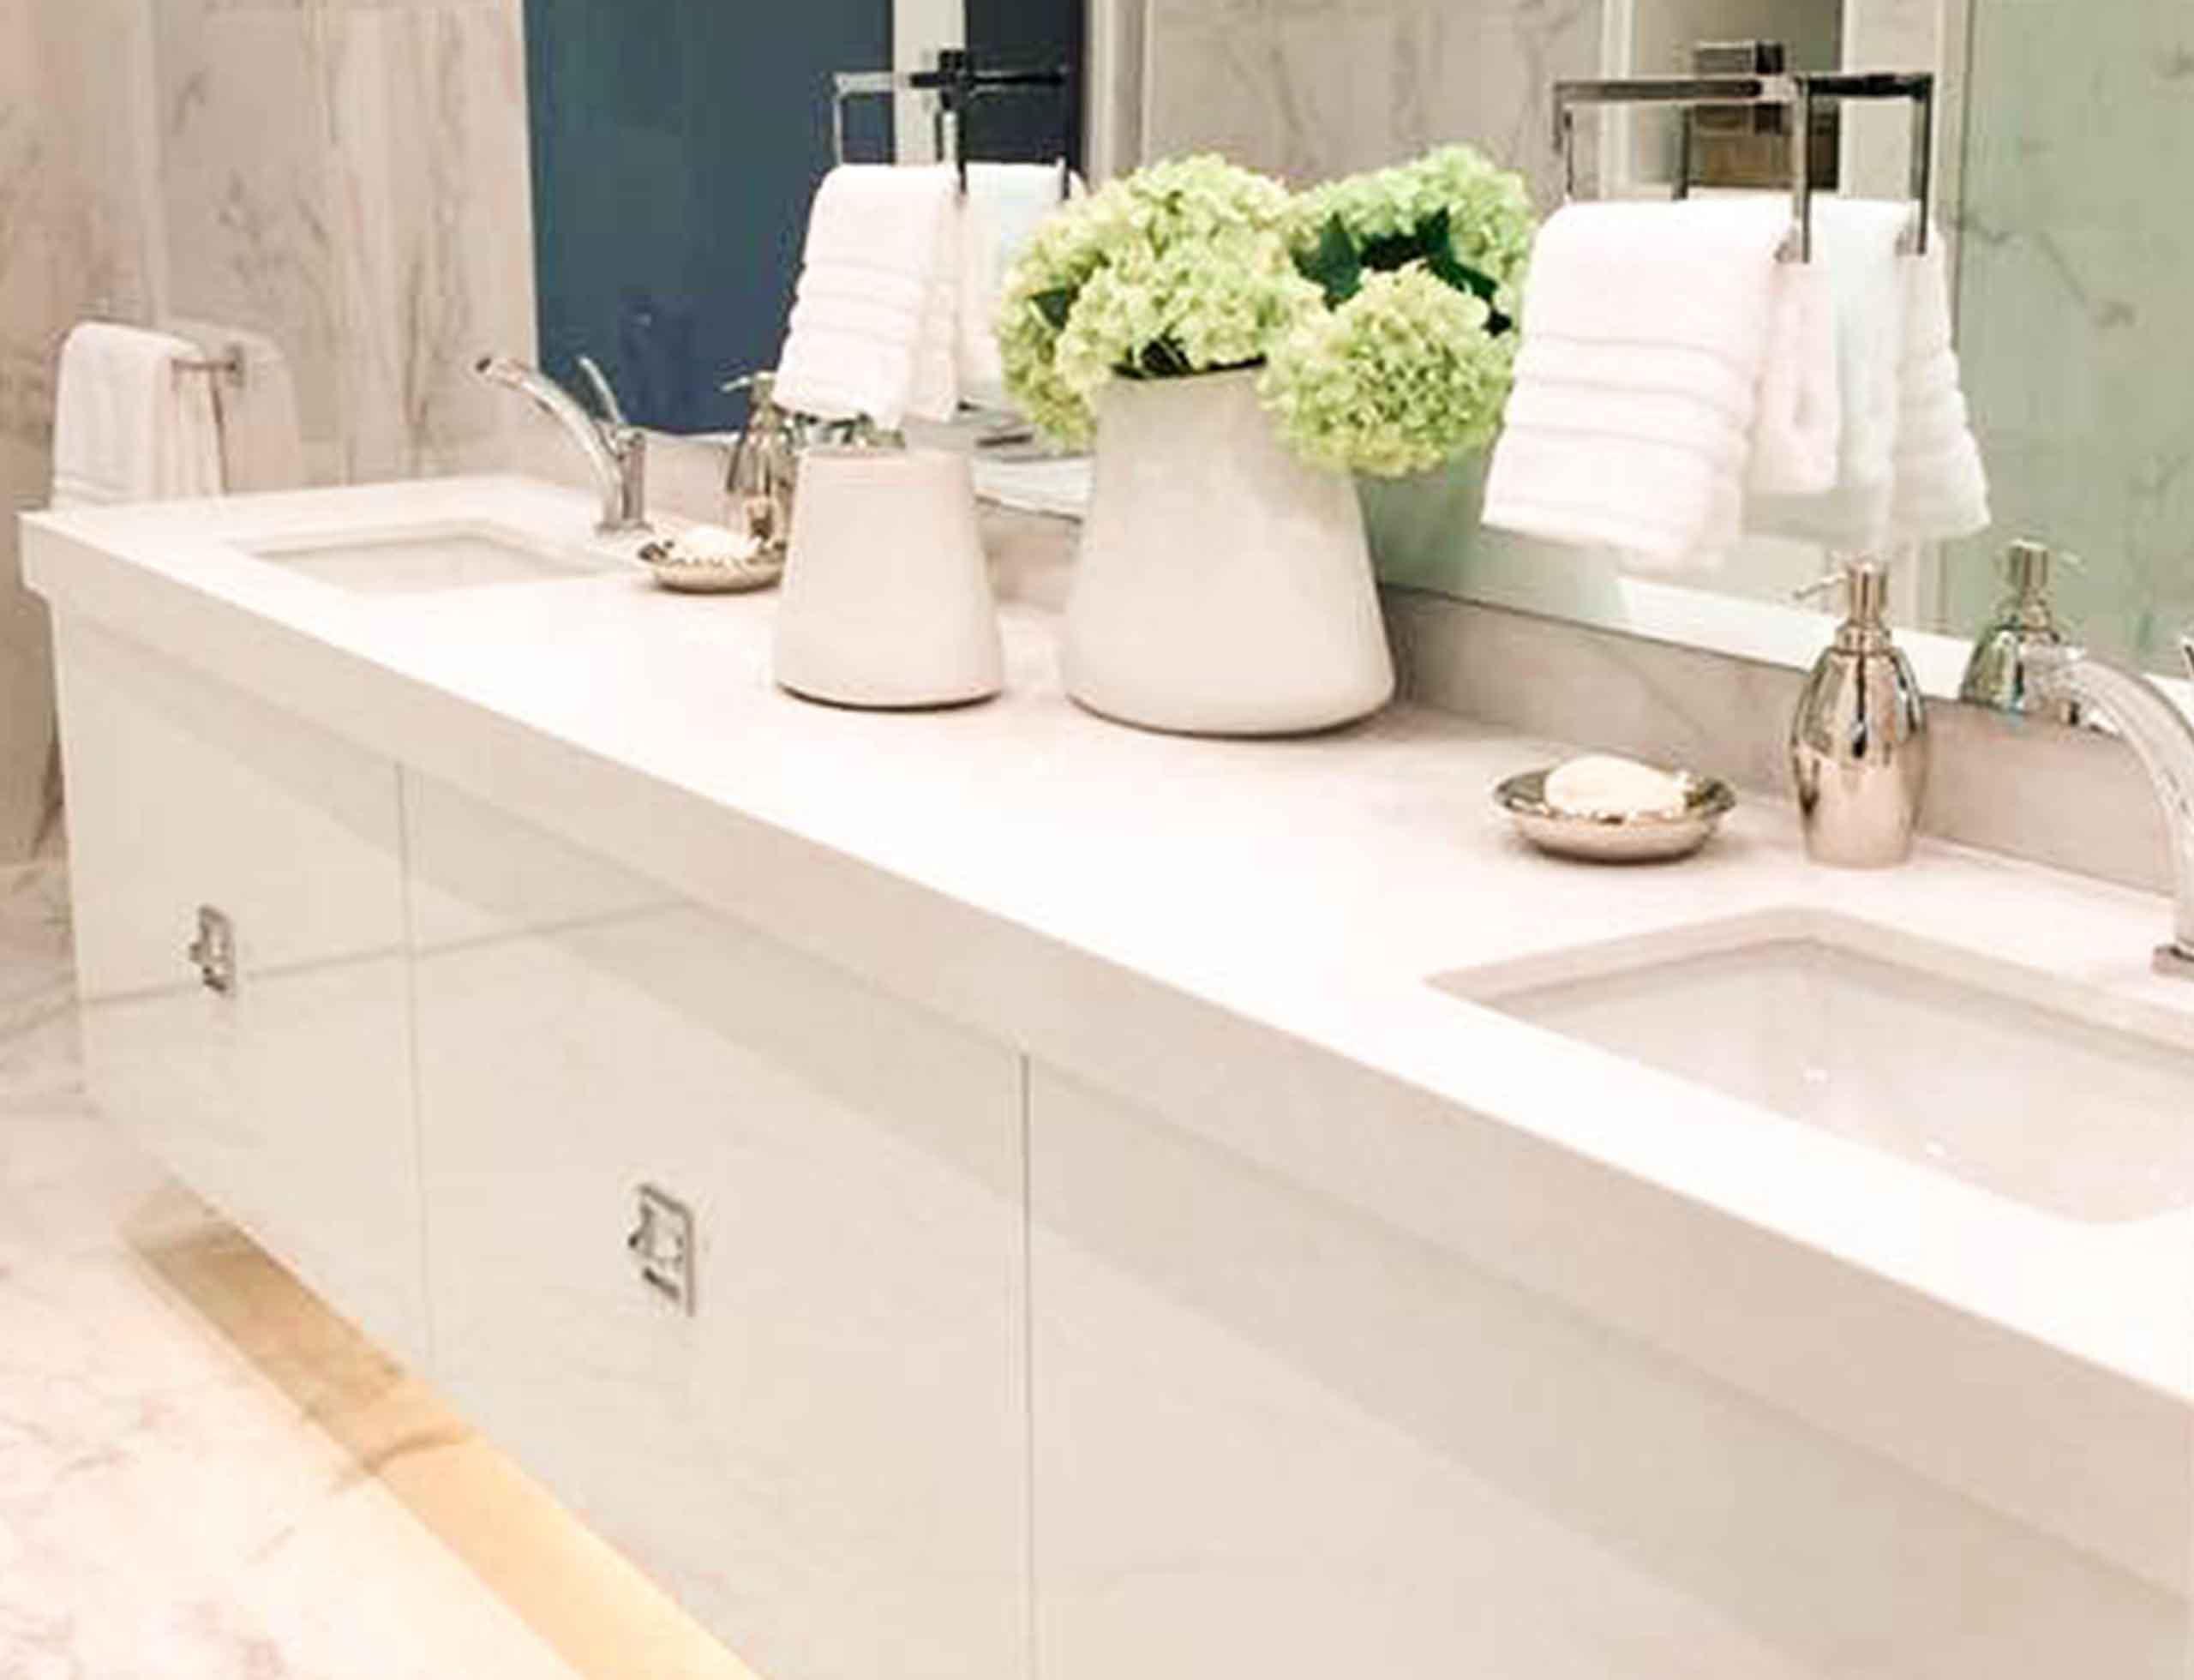 century-cabinets-marble-bathroom-countertops.jpg